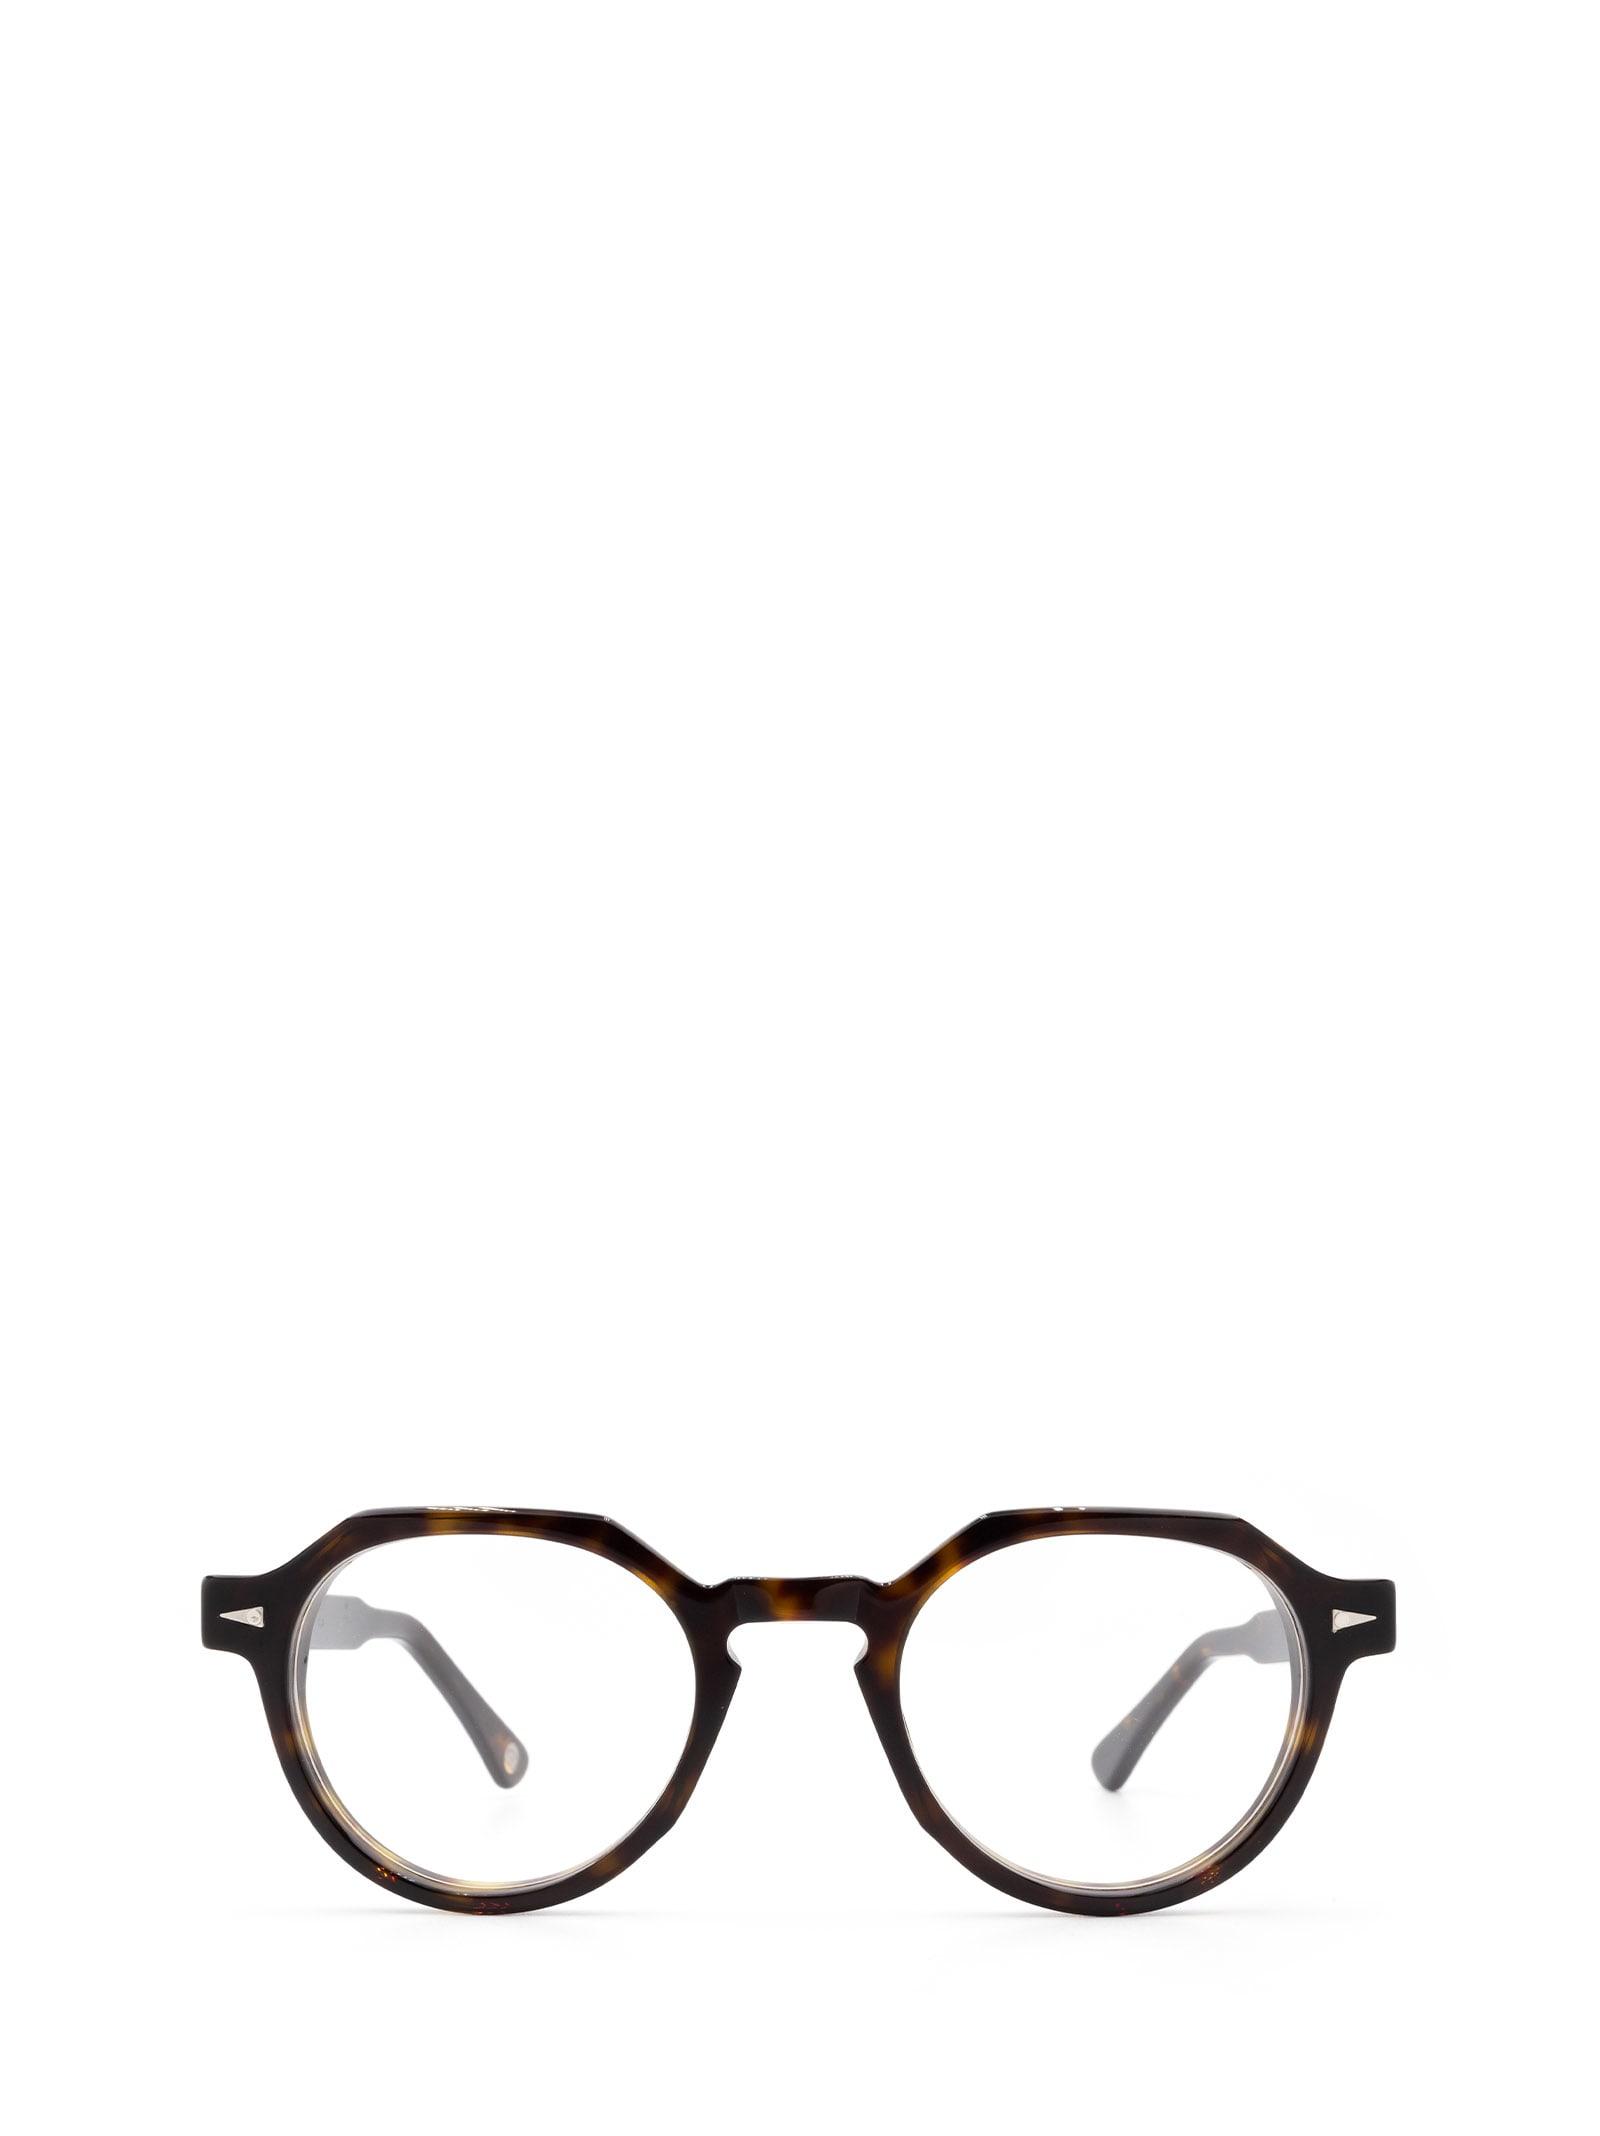 AHLEM Ahlem Rue Bosquet Dark Turtle Glasses